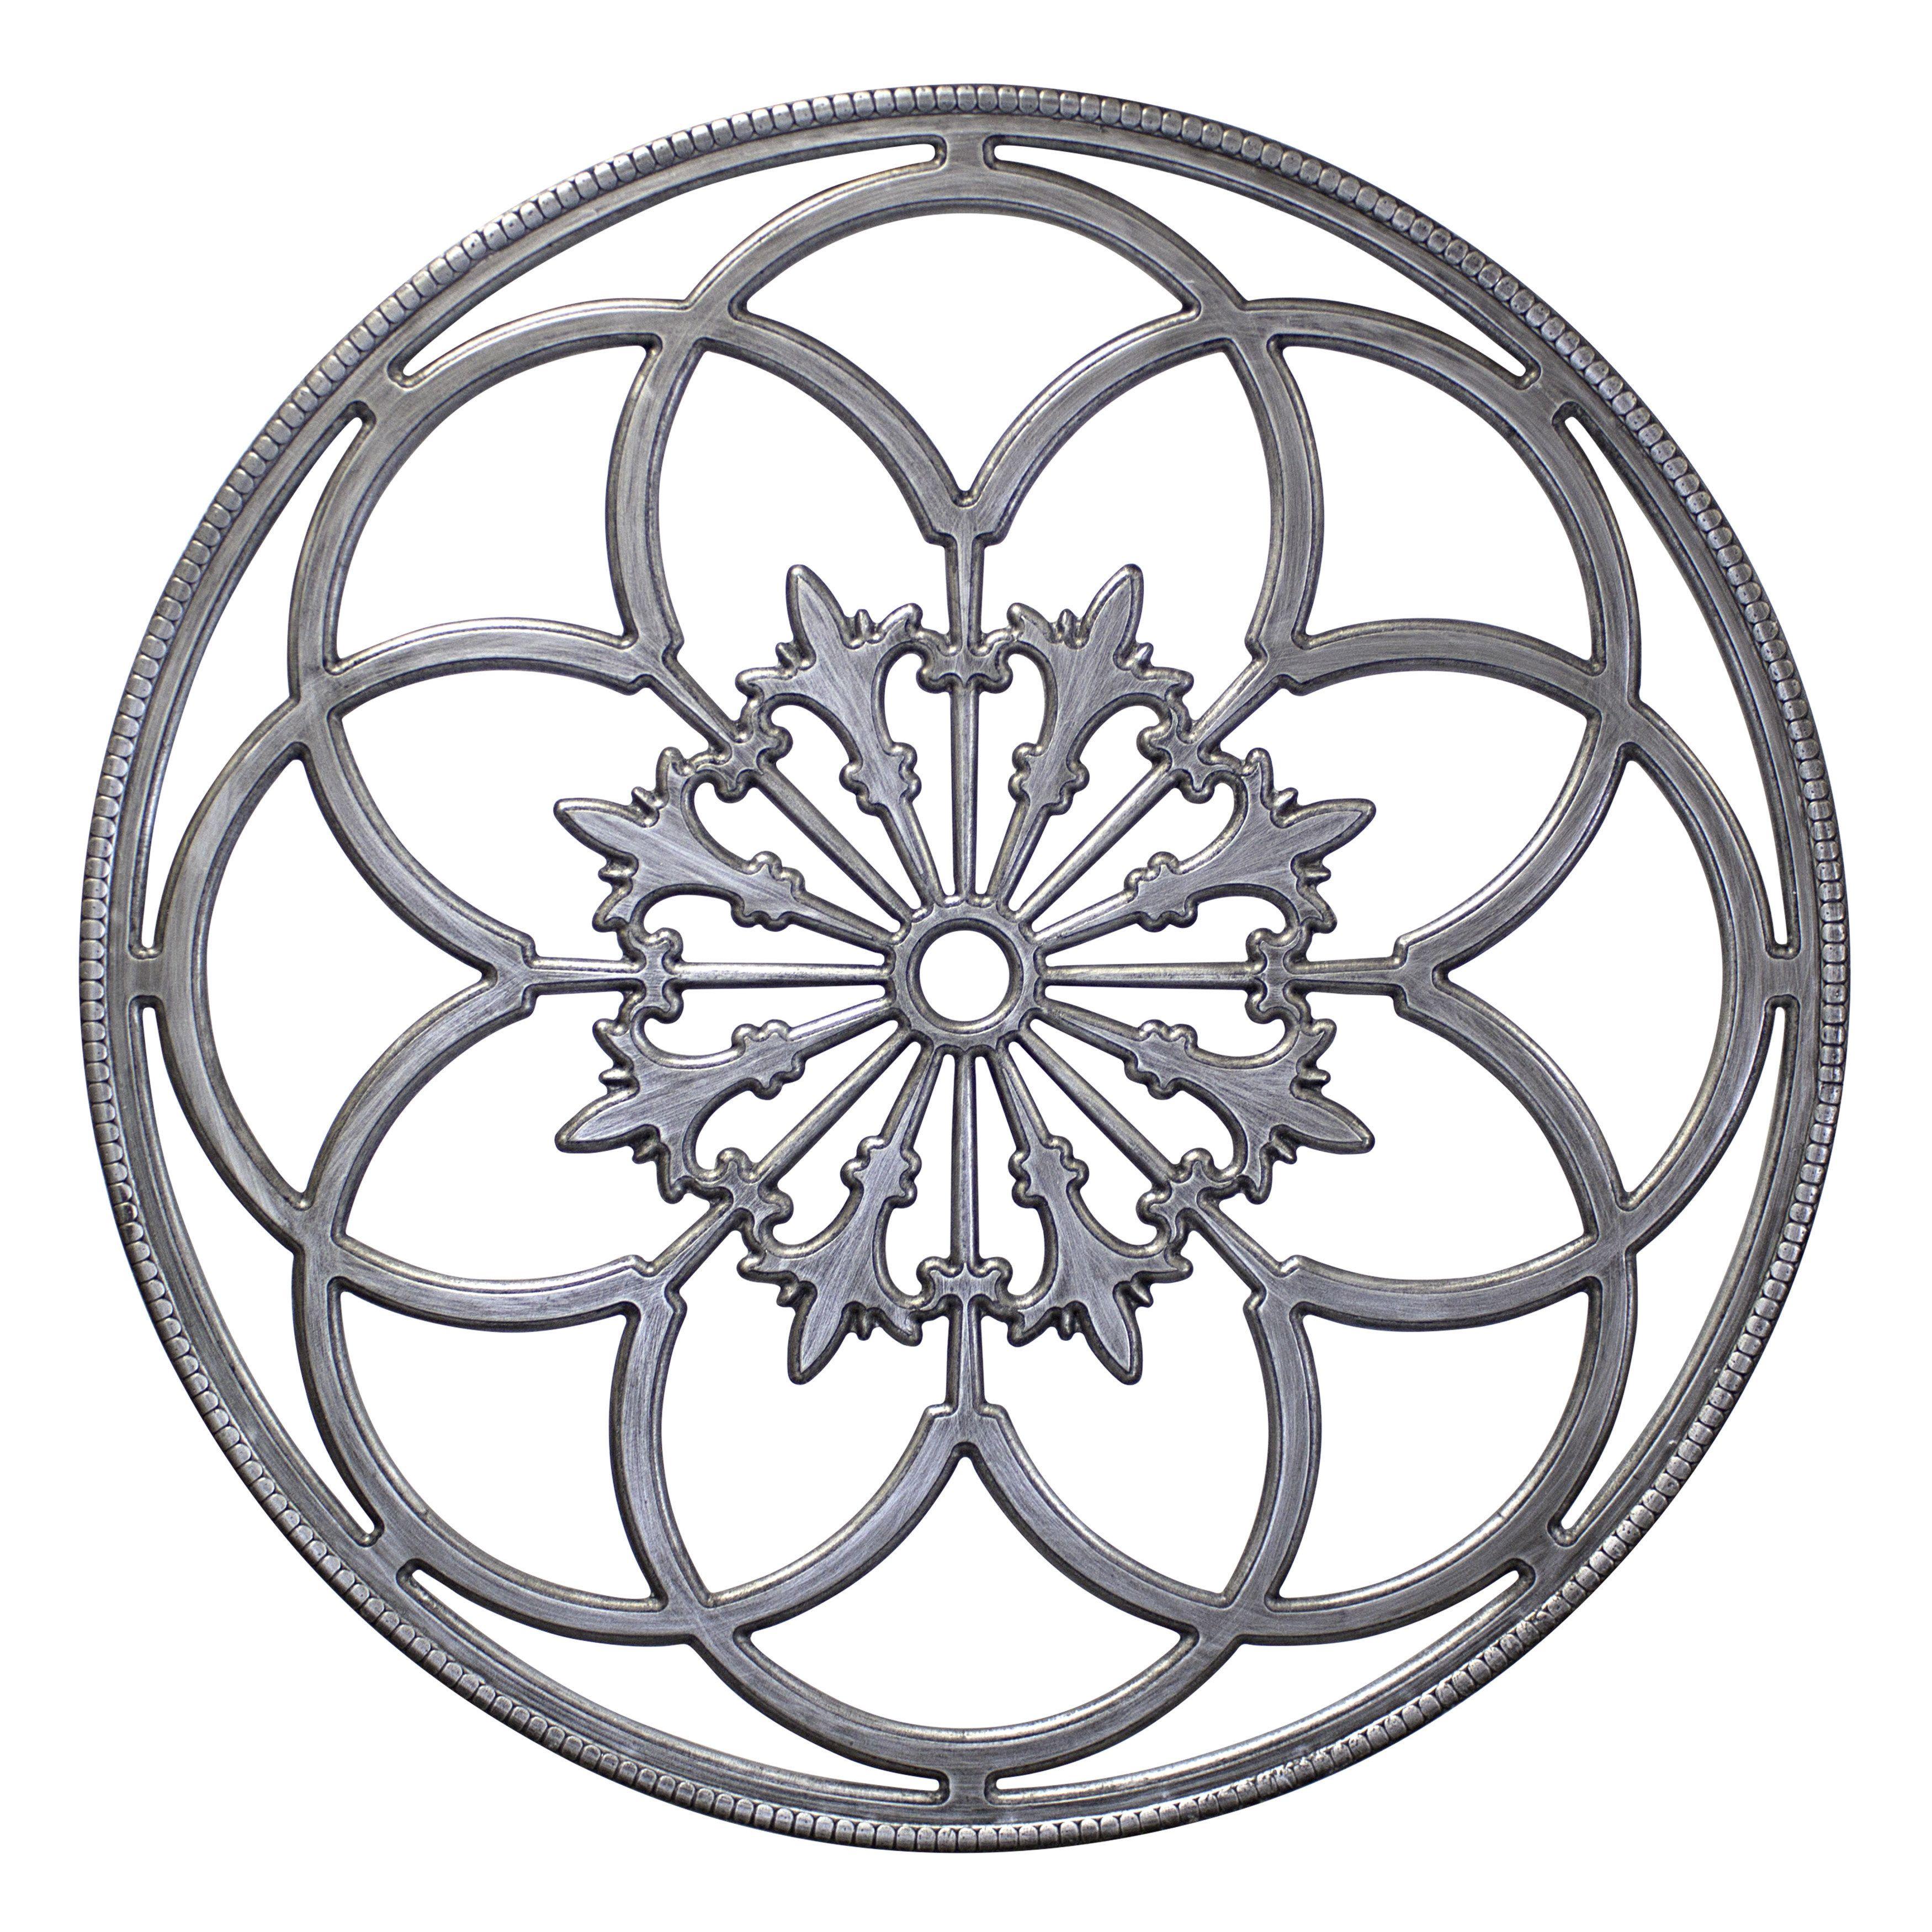 Kate anc laurel ondelette round medallion wood wall art plaque